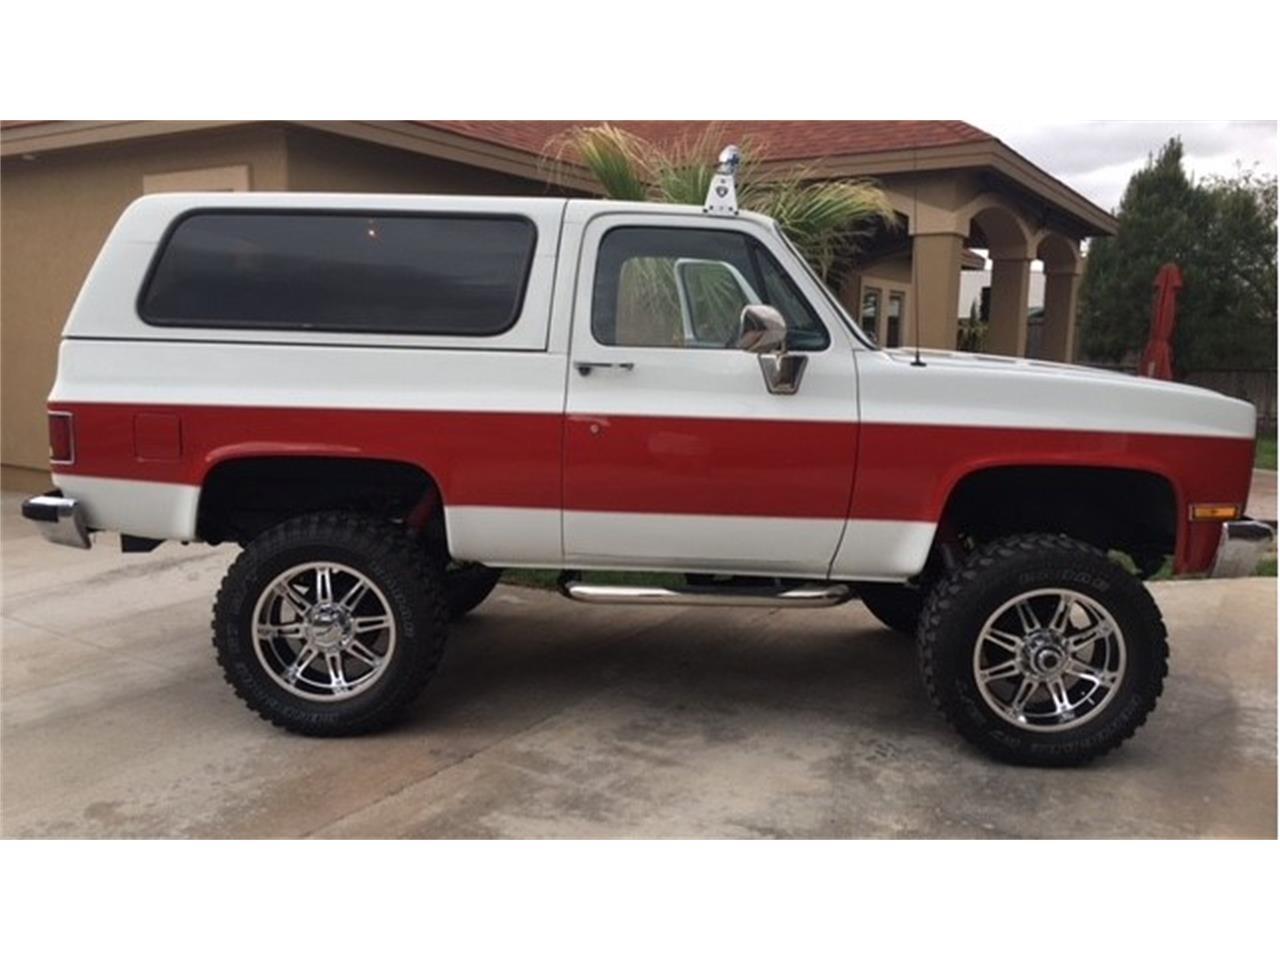 1989 Chevrolet Blazer (CC-1249451) for sale in Mundelein, Illinois